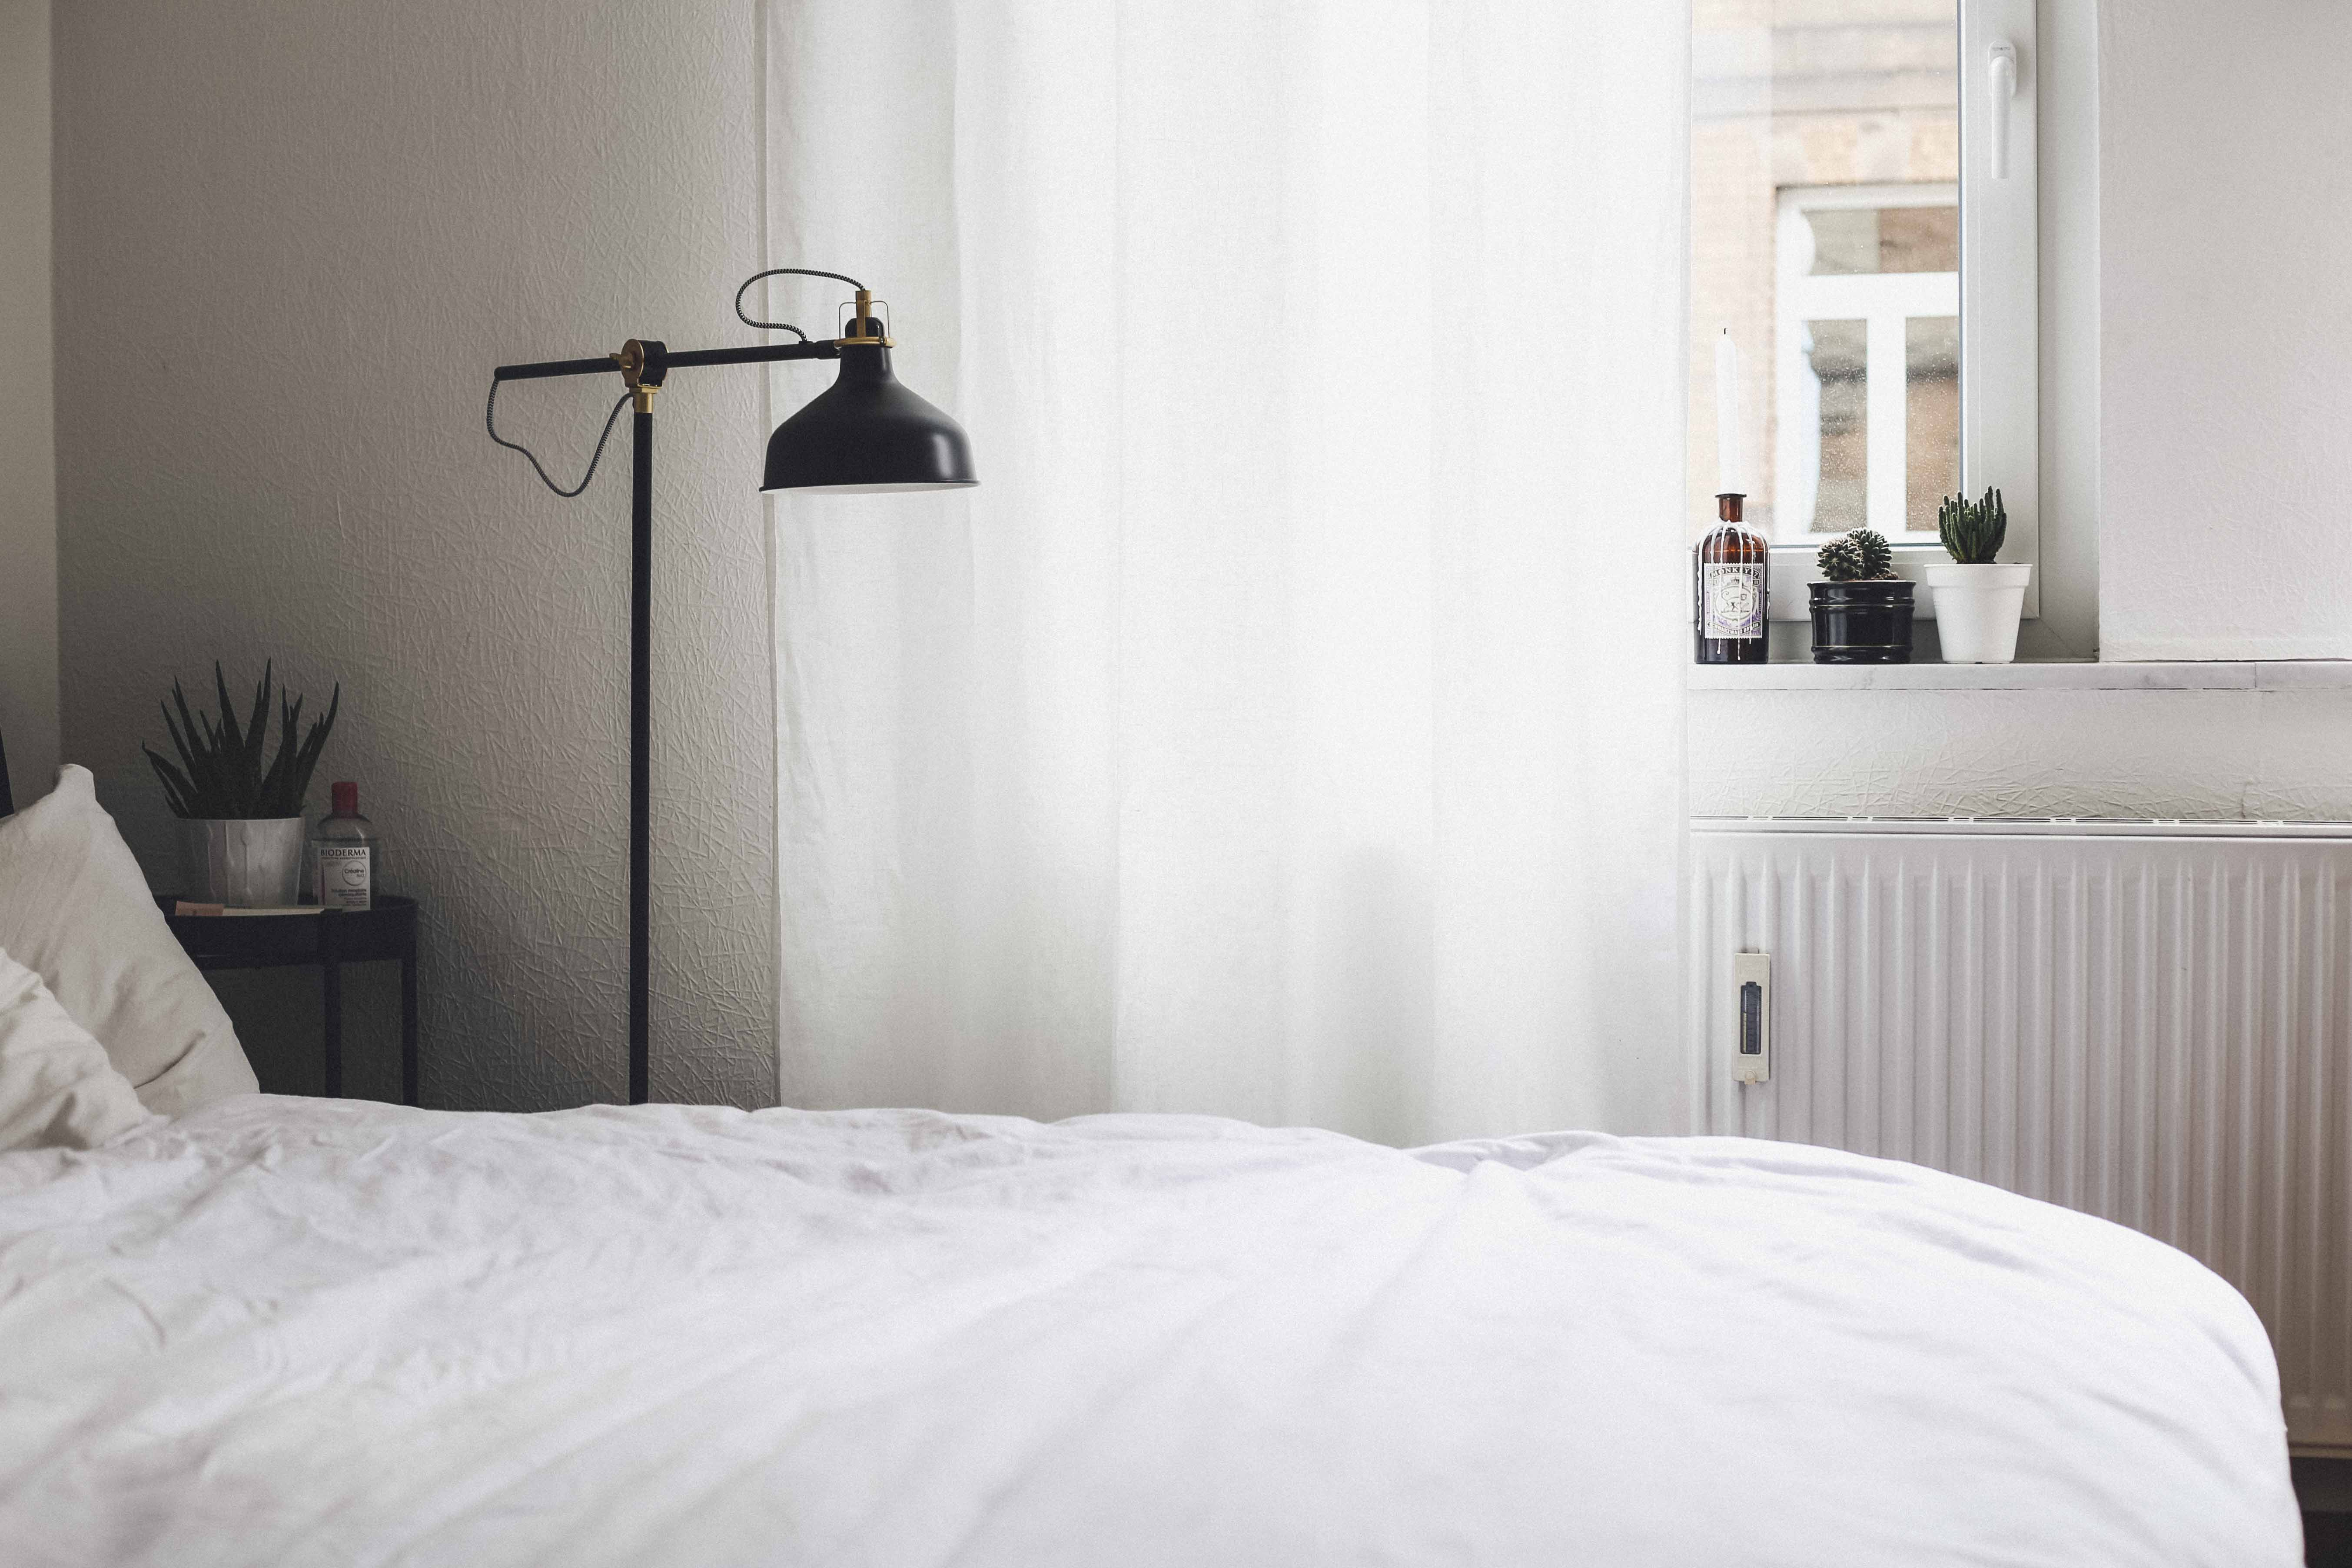 doandlive bett schlafzimmer interior ottoliving otto 3. Black Bedroom Furniture Sets. Home Design Ideas